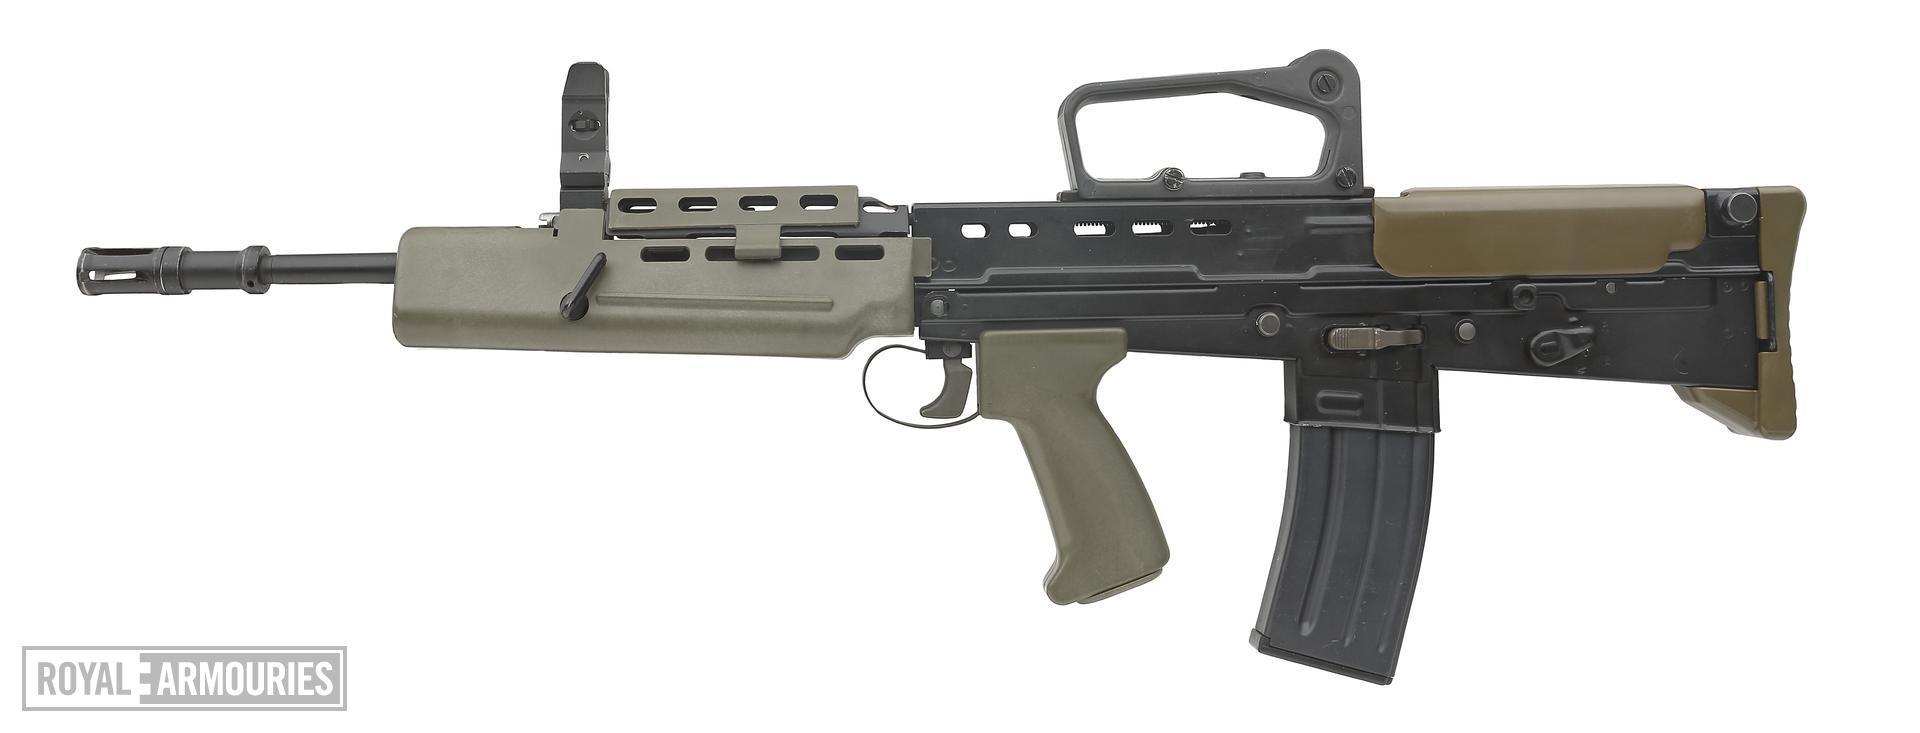 Centrefire automatic rifle - SA80 L85A1